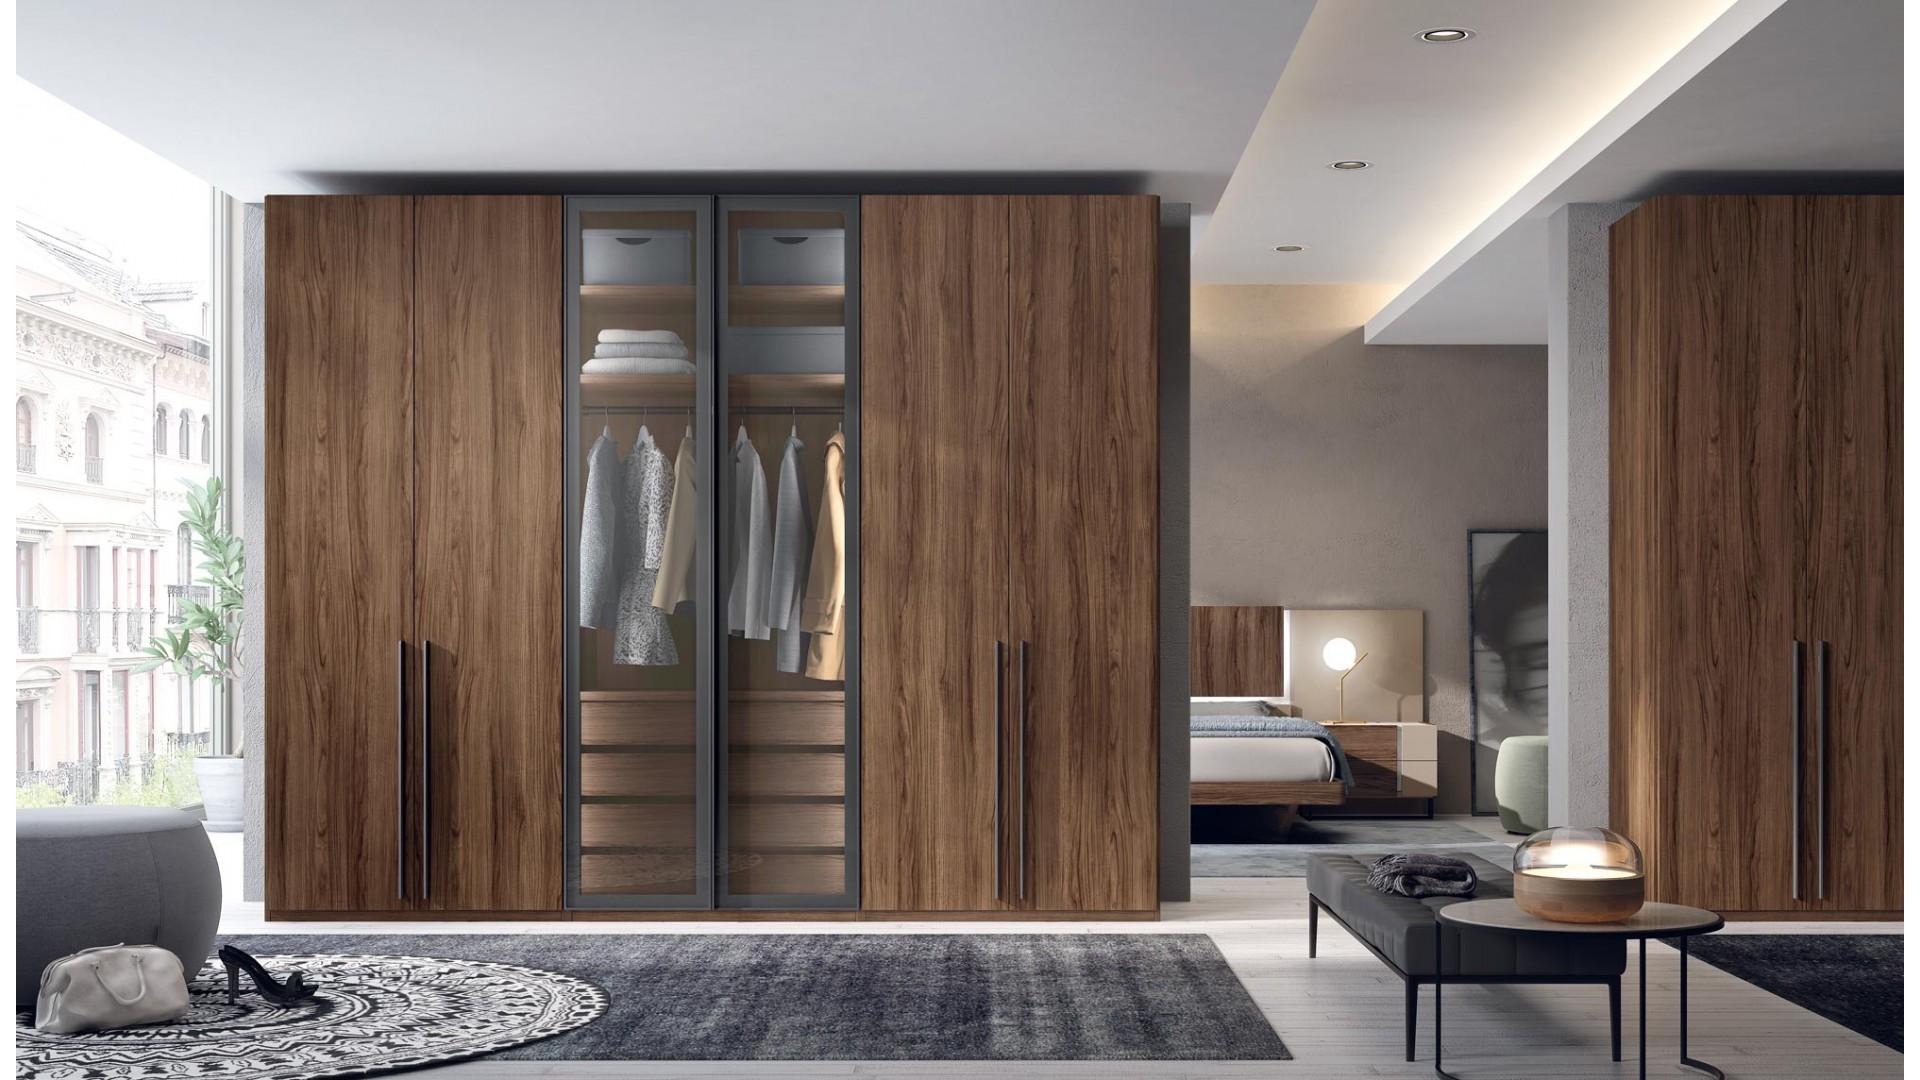 Armoire dressing 6 portes battantes 4 tiroirs PERSONNALISABLE COSMO52 - GLICERIO